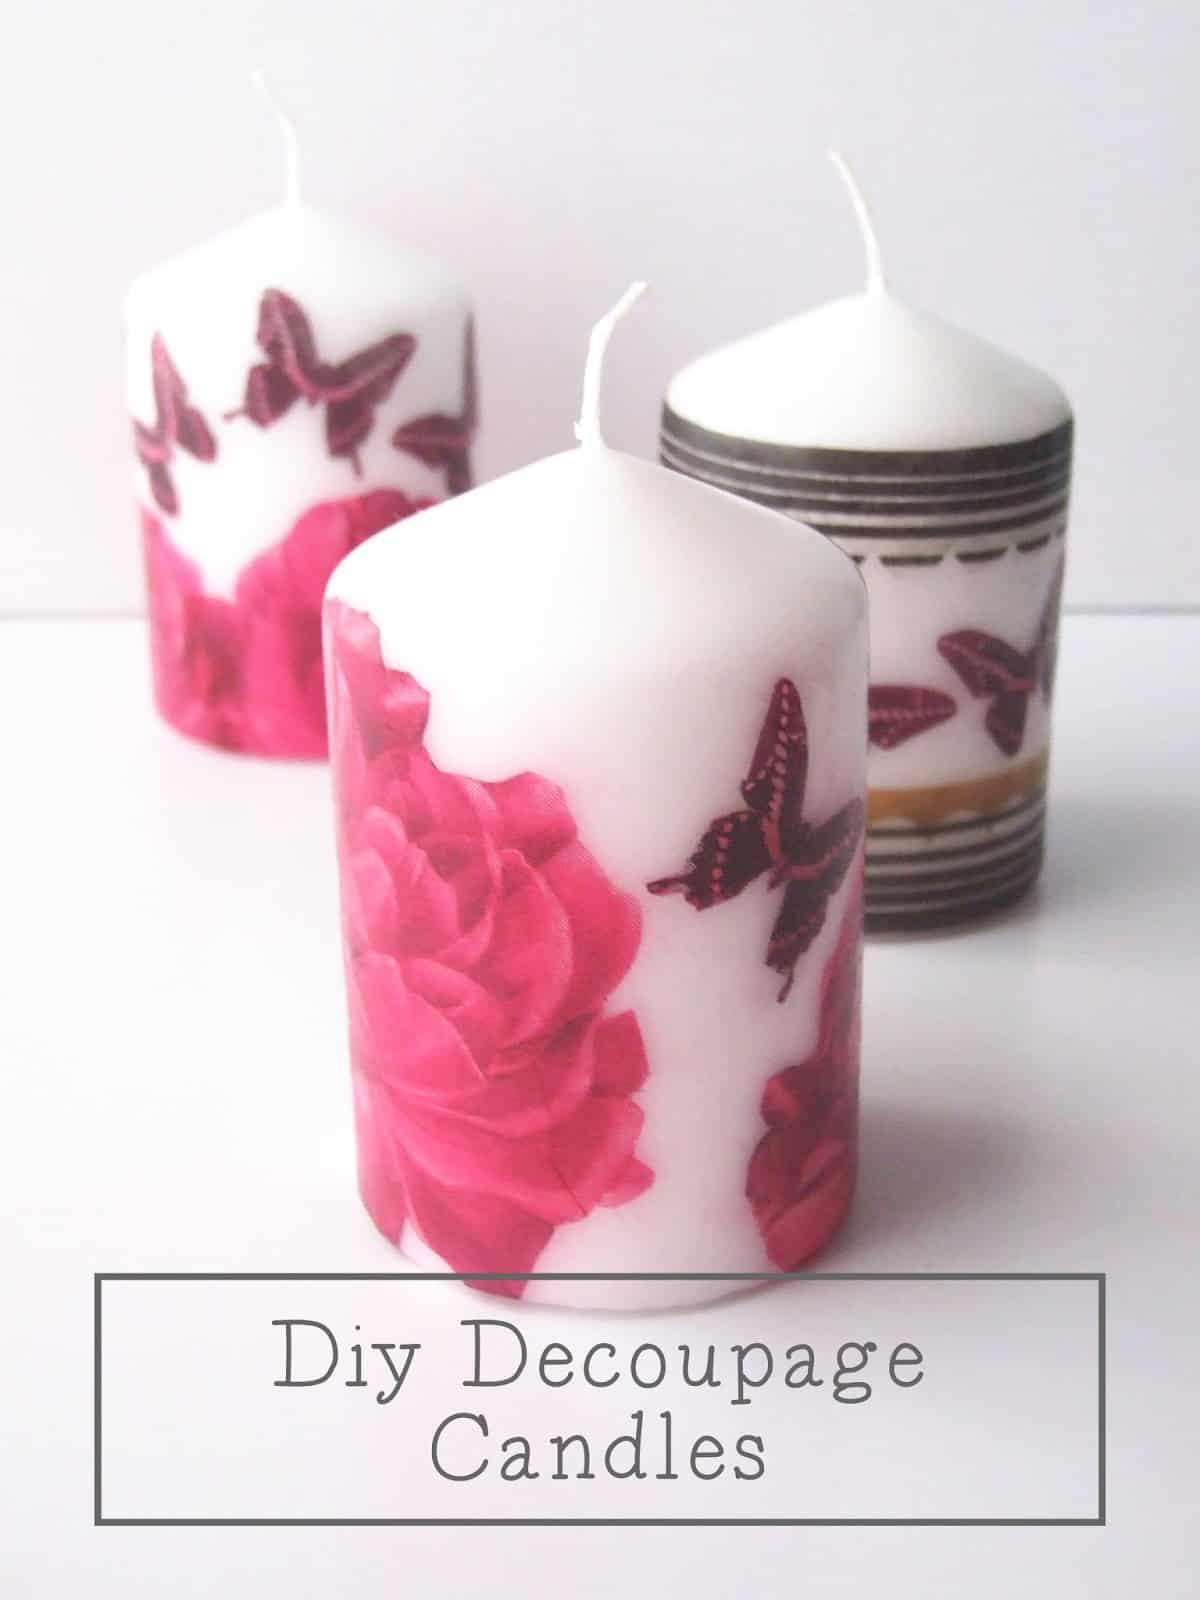 floral-decoupage-candle-title